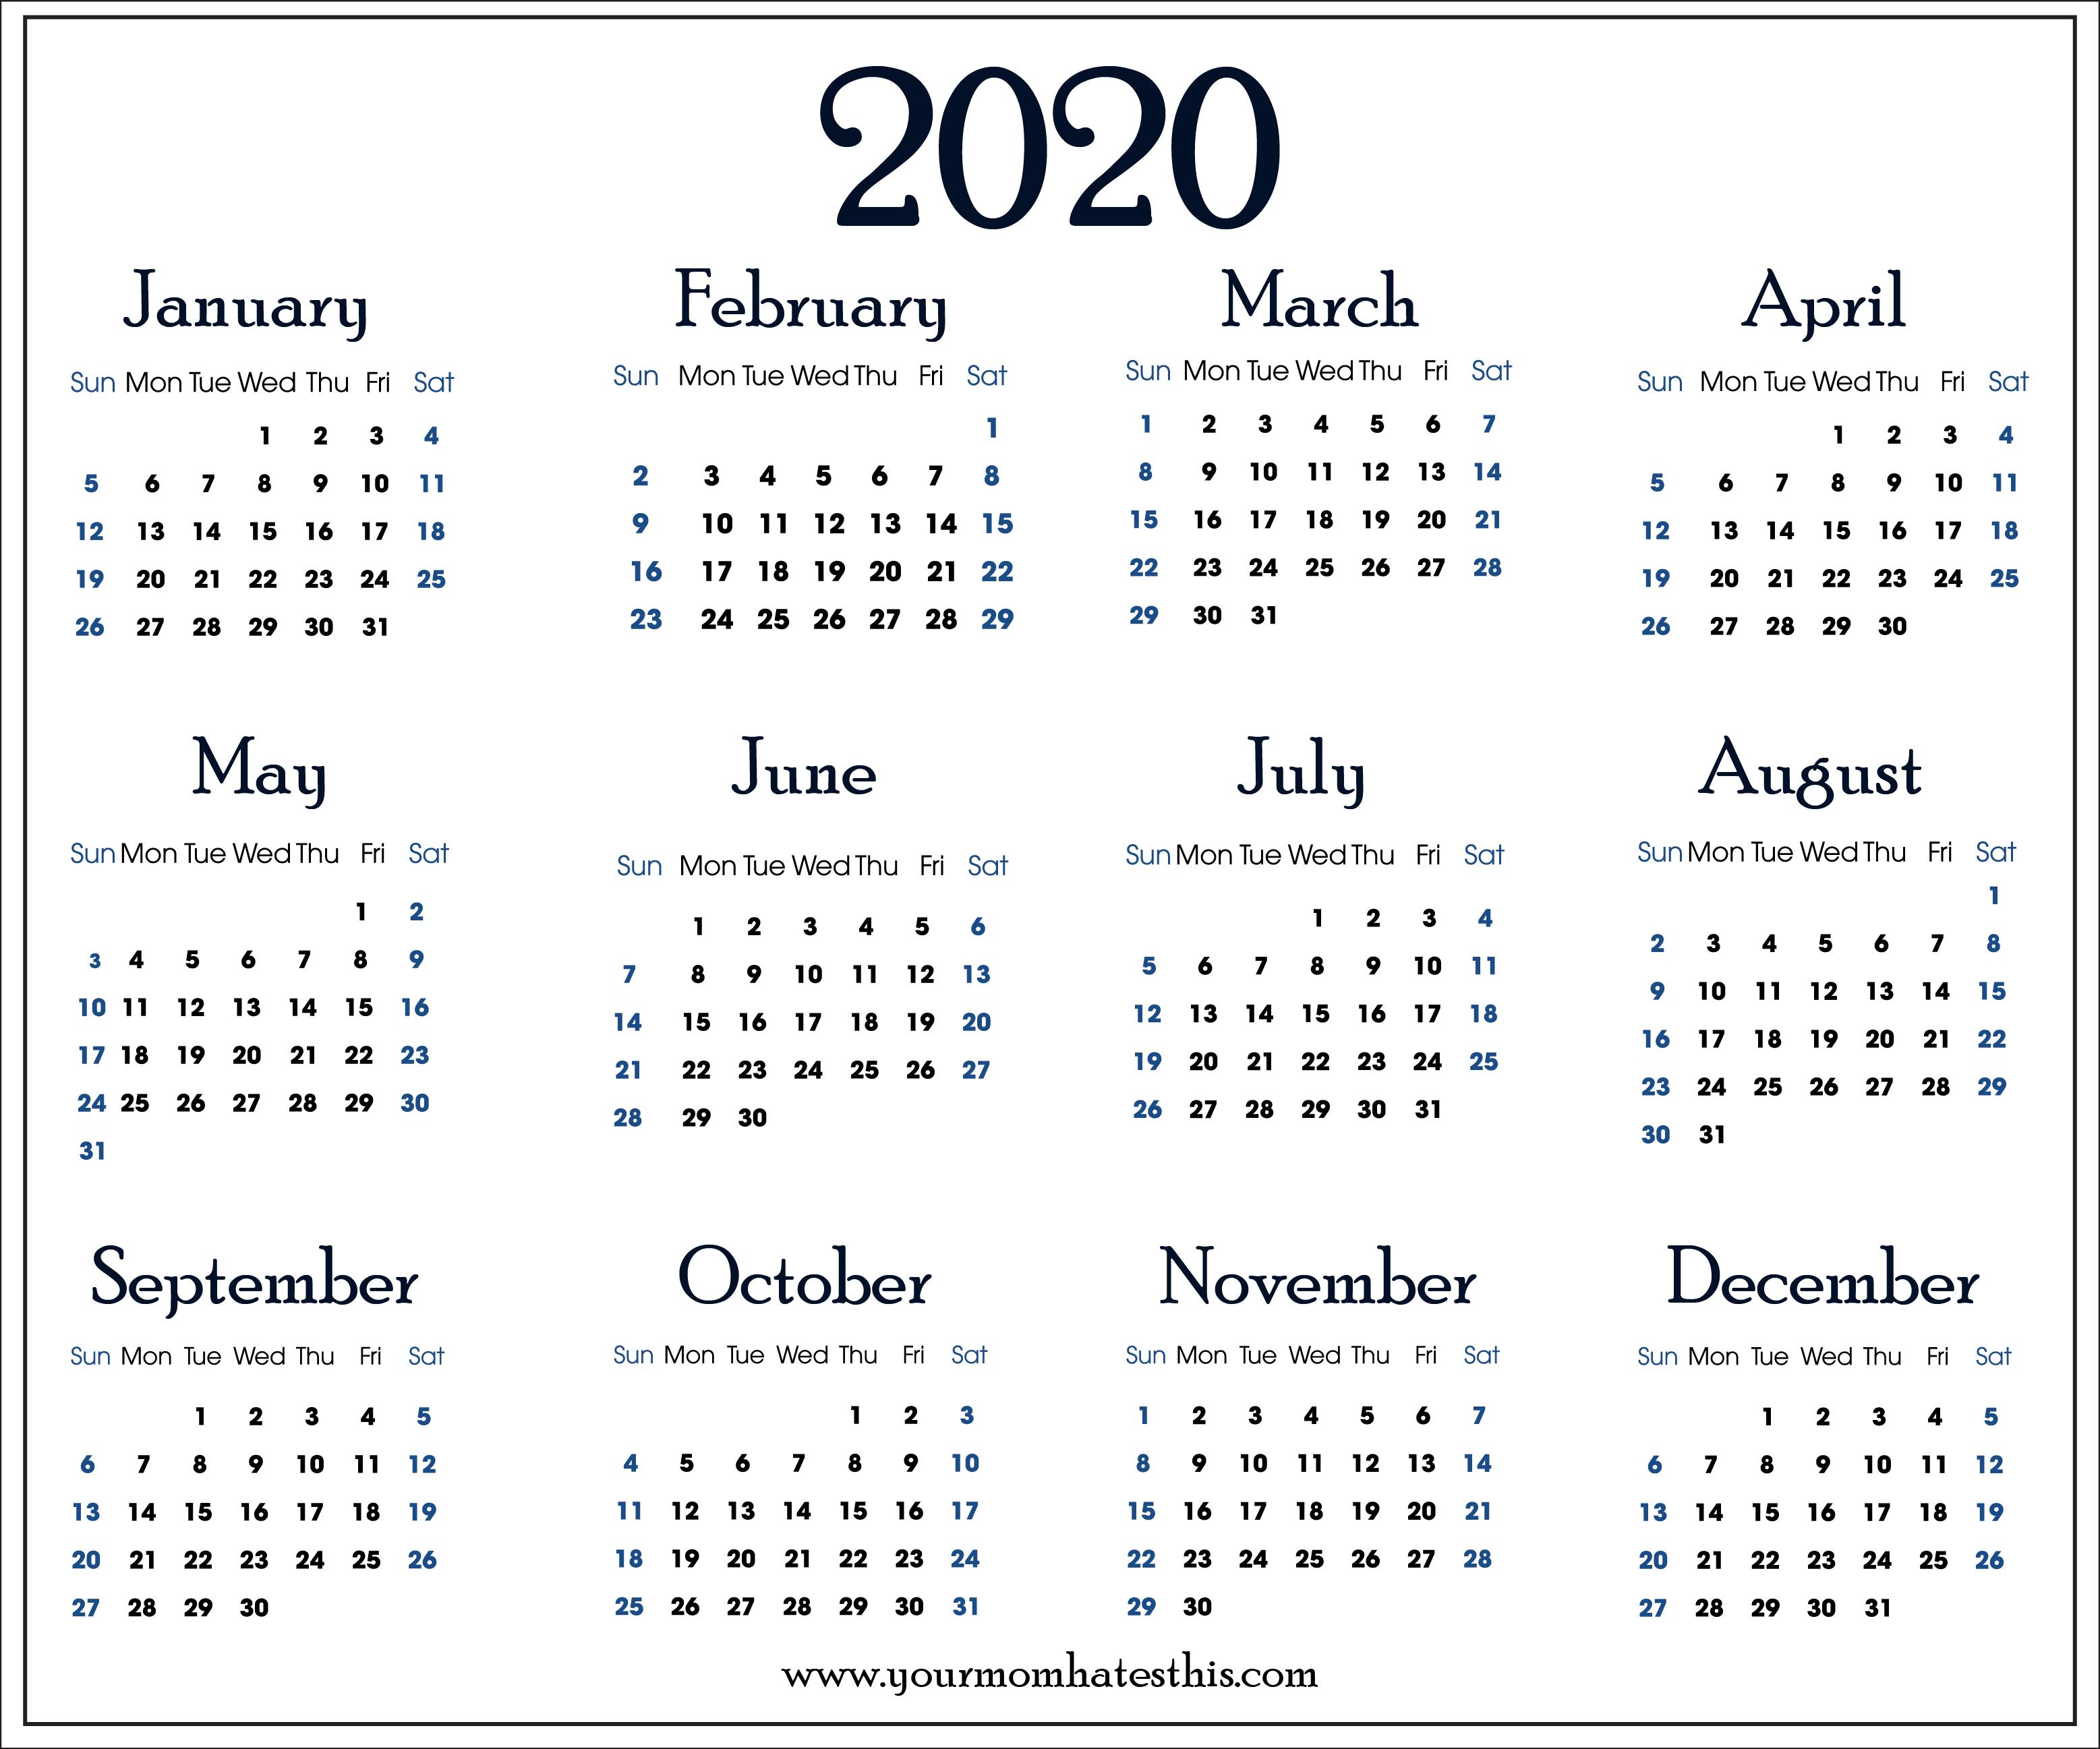 2020 Calendars In Pdf  Download Templates Of Calendar 2020 with regard to November Calendar 2020 Transparent